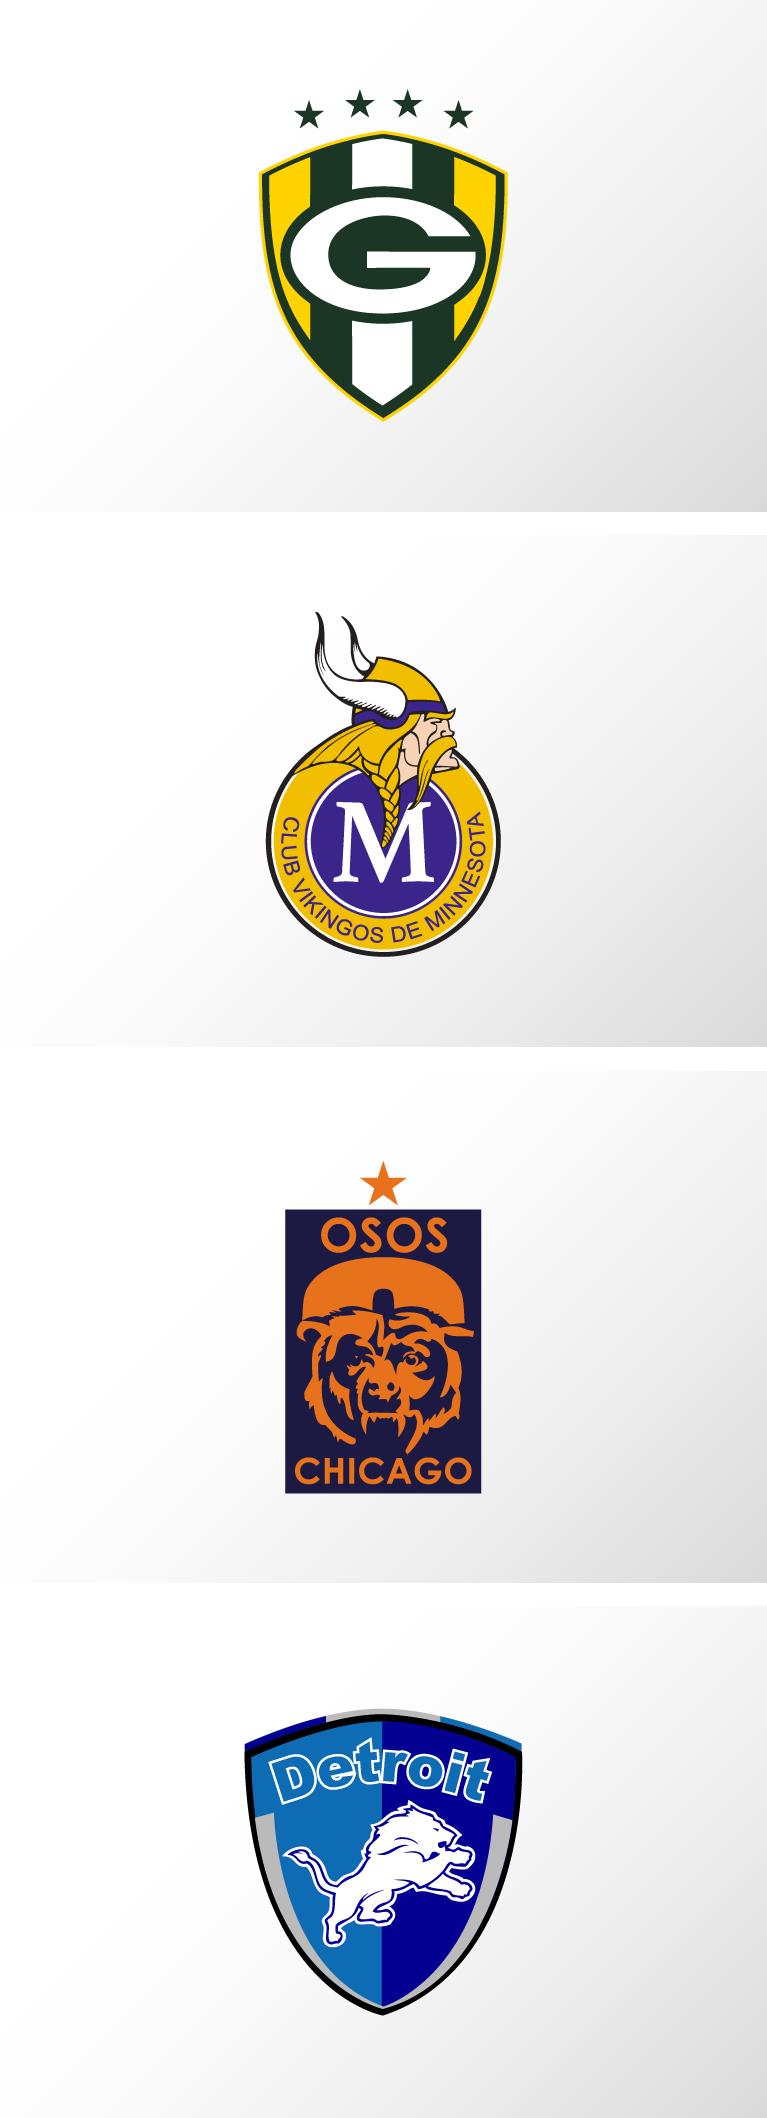 Liga Nfl Mx On Behance In 2020 Sports Logo Juventus Logo Sport Team Logos